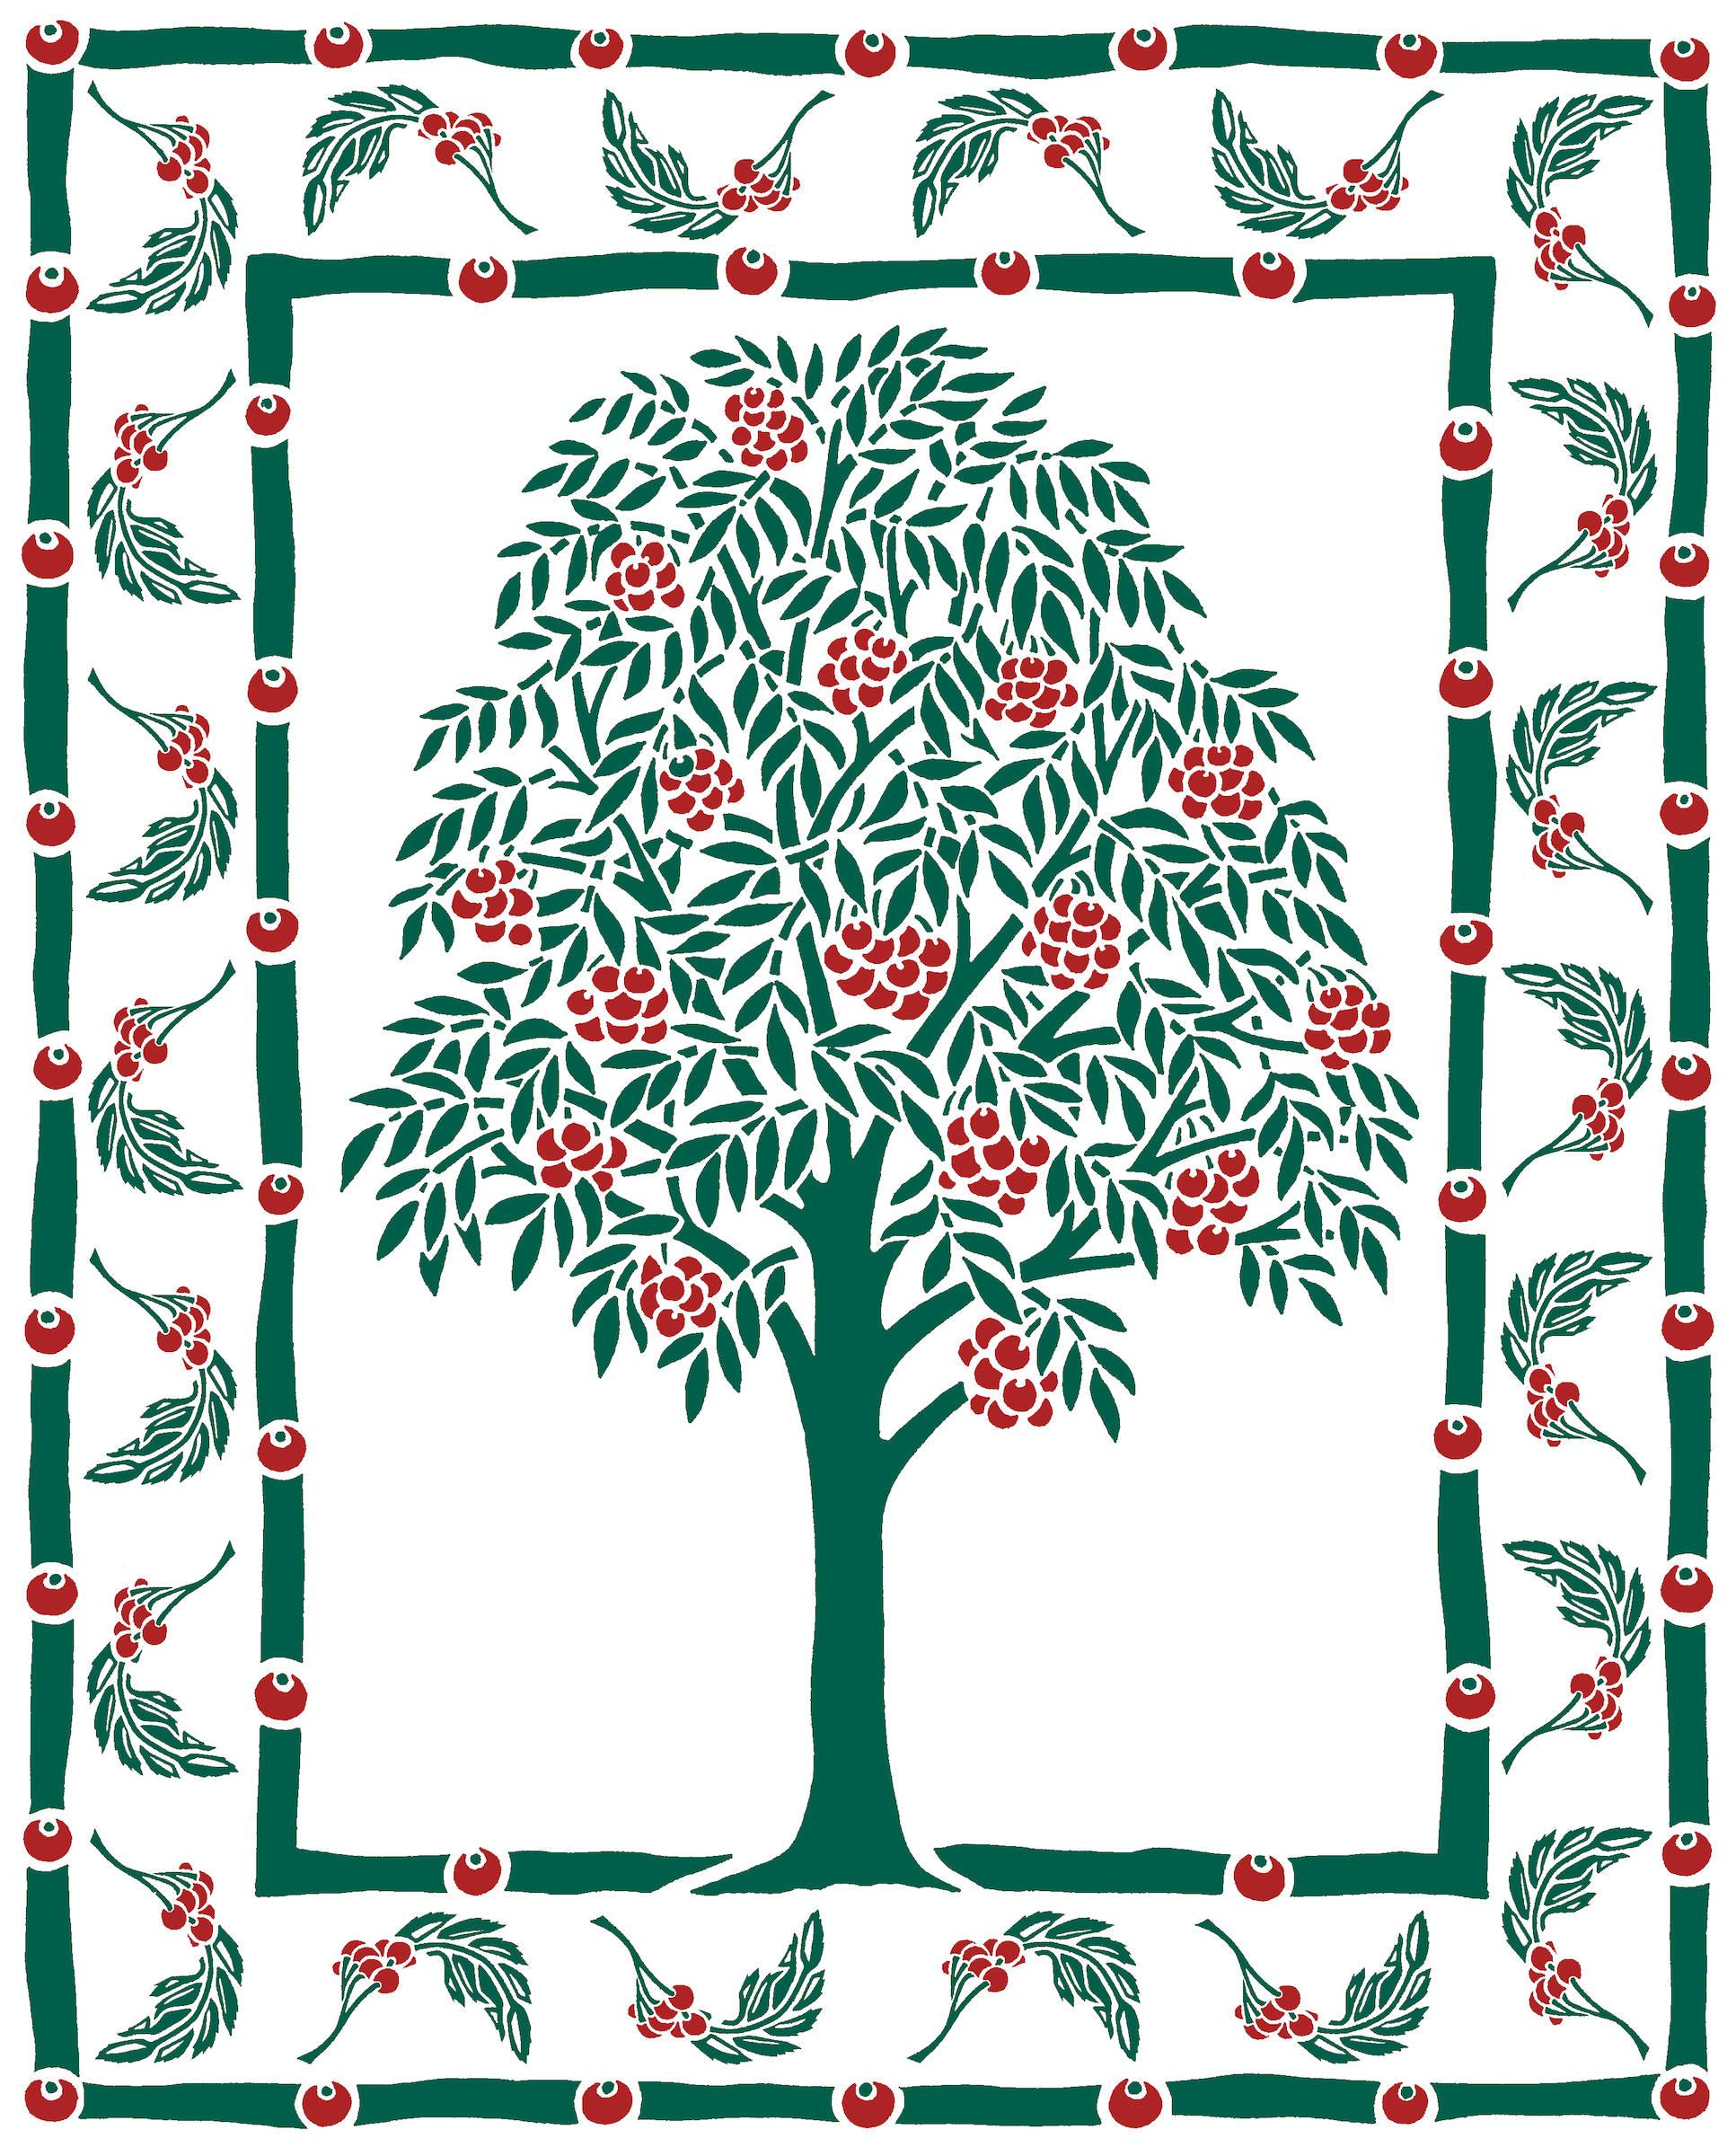 Rowan Tree tree.jpg